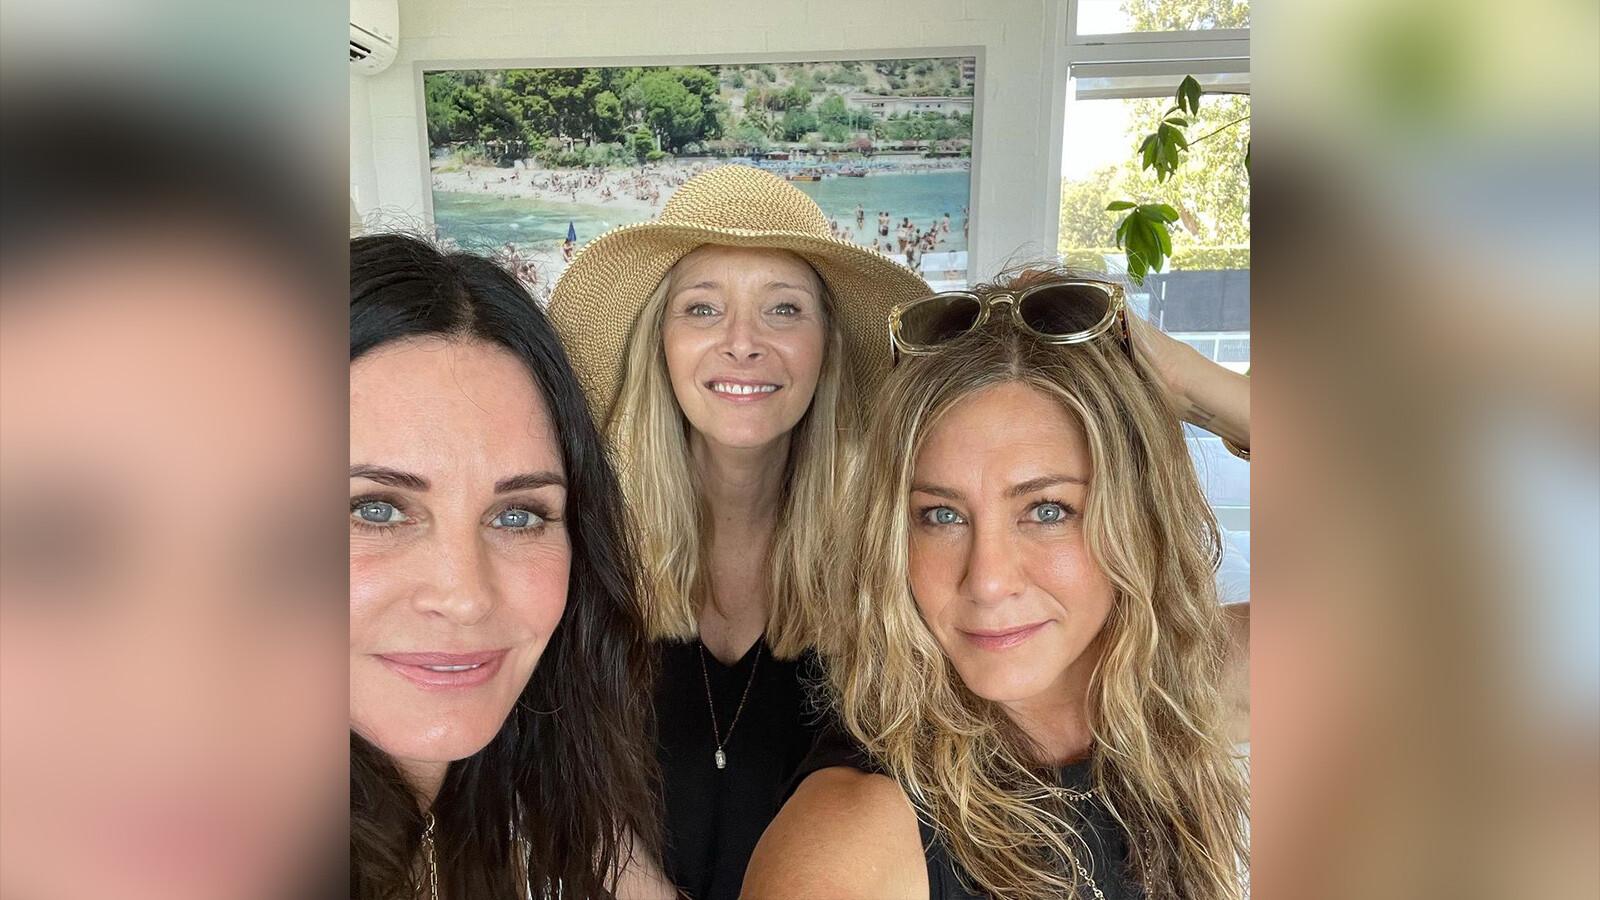 Courteney Cox, Jennifer Aniston and Lisa Kudrow reunite for July 4